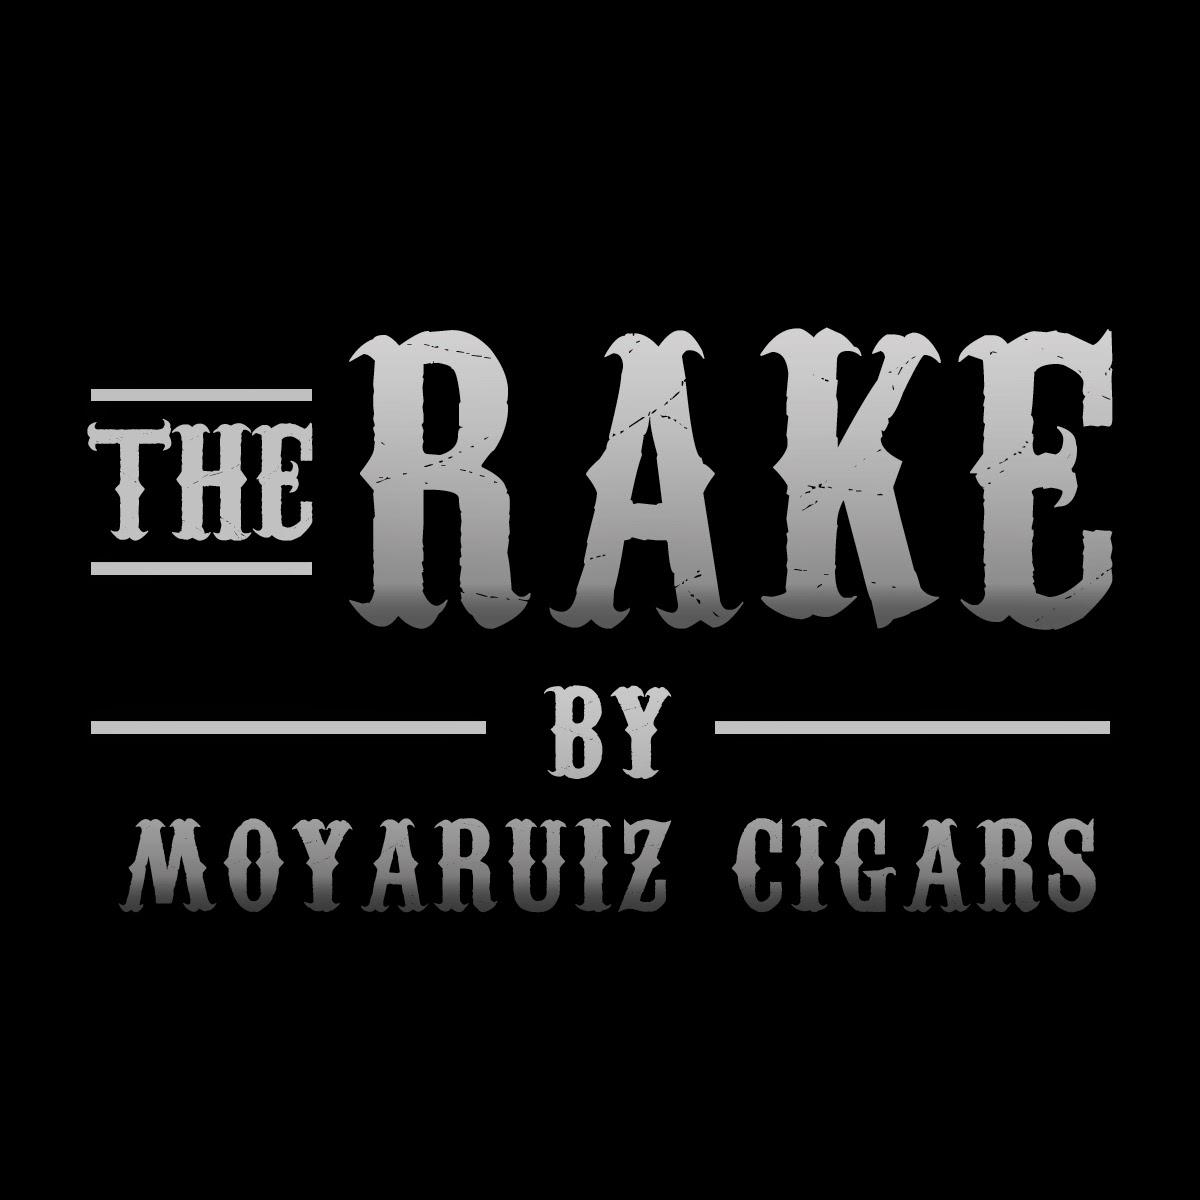 Cigar News: MoyaRuiz Announces Launch for The Rake and First Poker Room